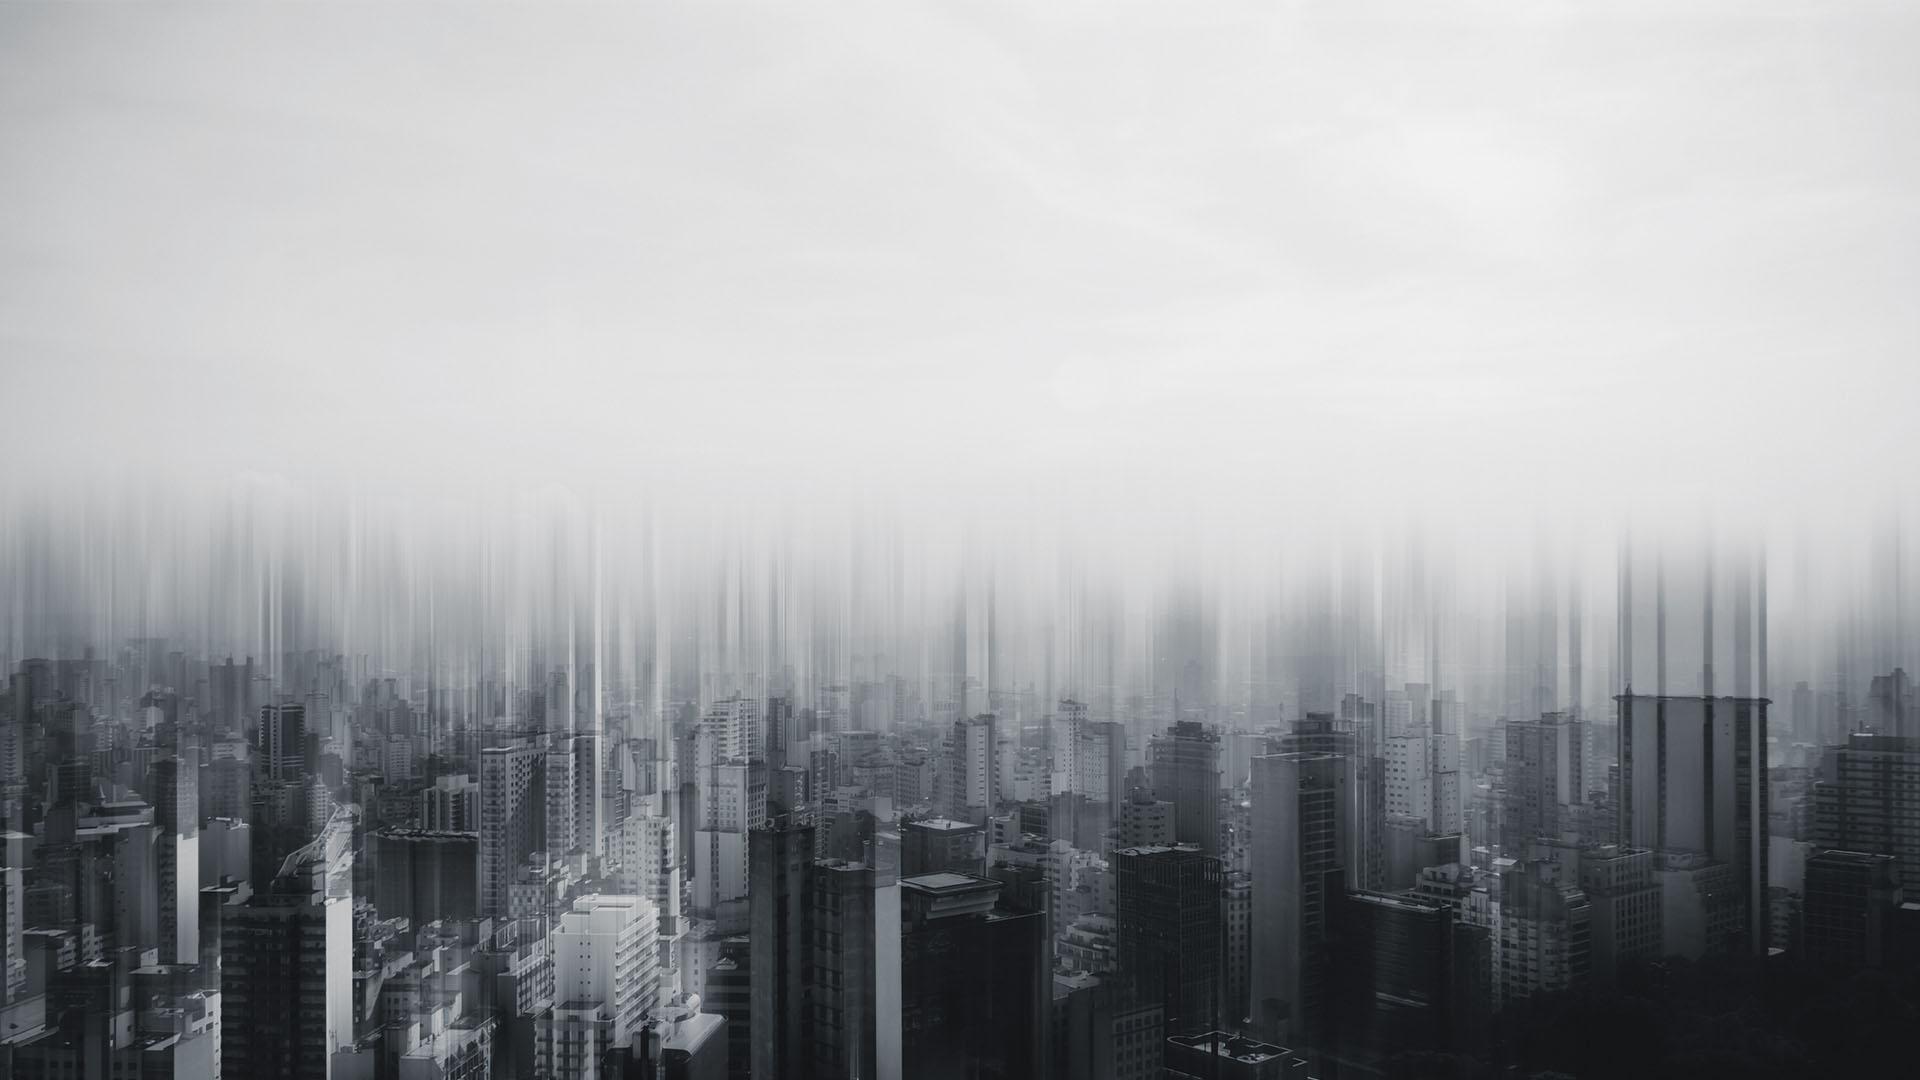 Black and white image of city skyline